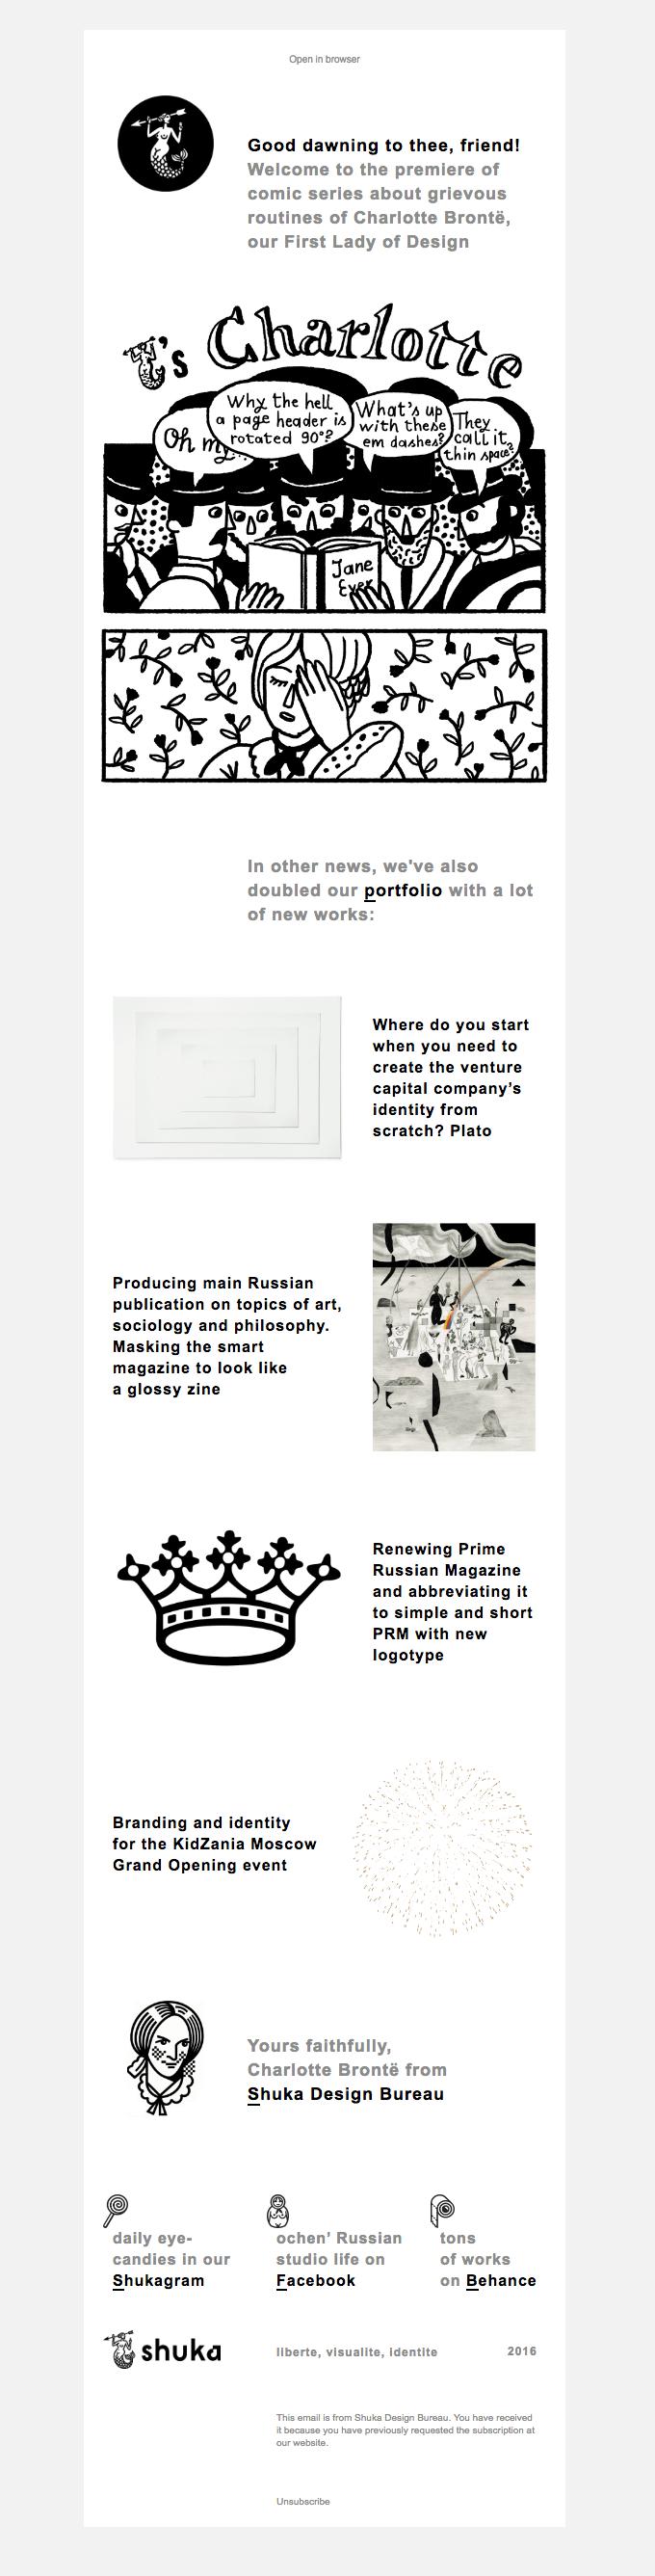 Business email examples-Shuka Design Bureau